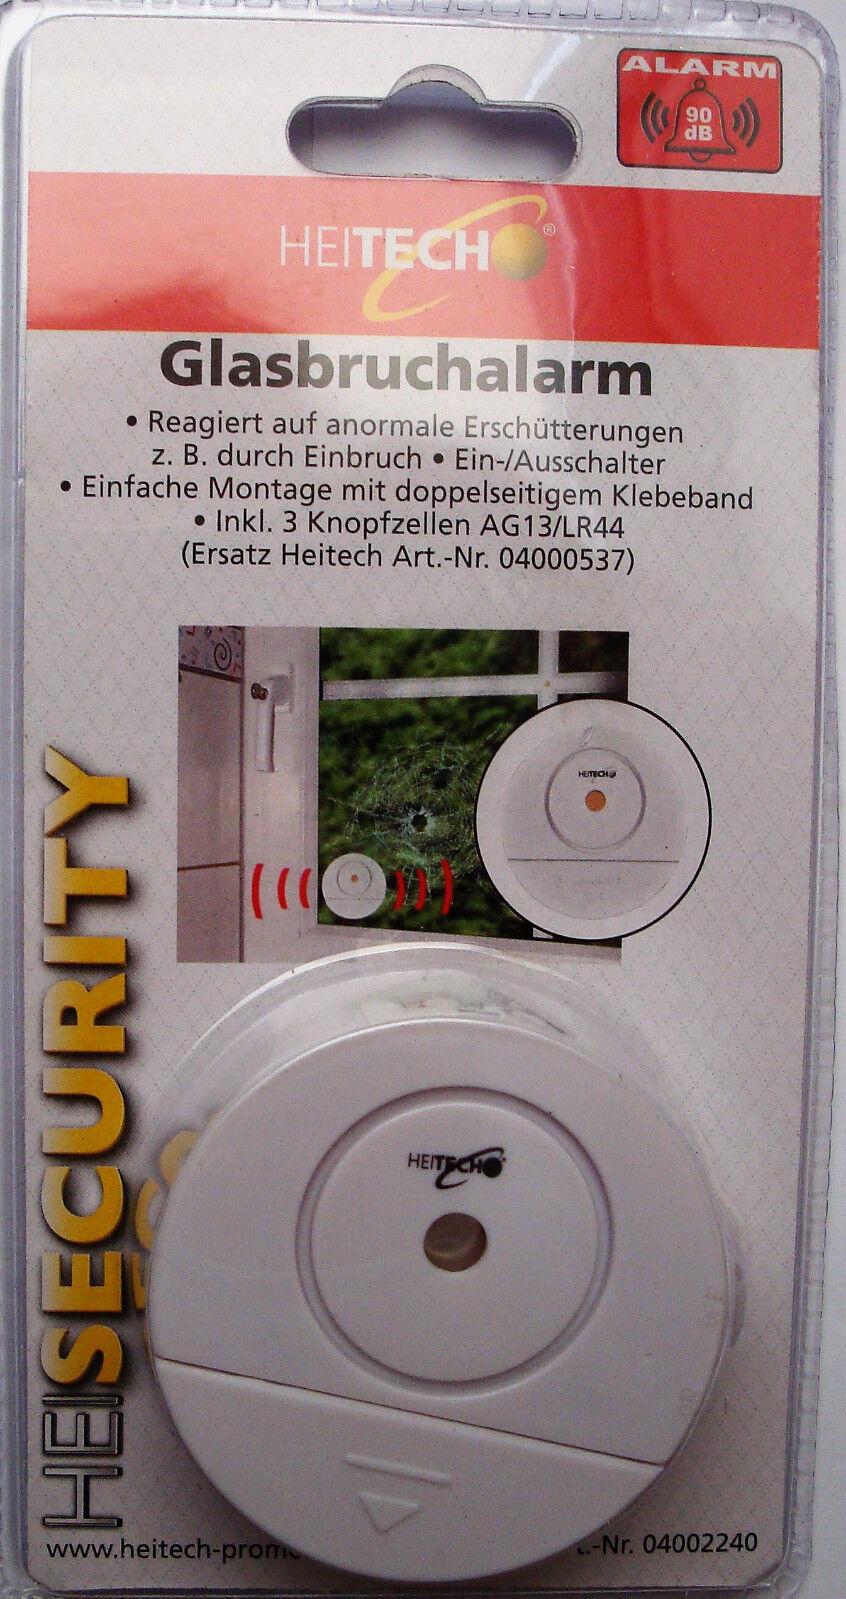 10 x Heitech Glasbruchalarm Fenster Tür Alarm 90dB  Melder Glas Sensor  NEU+OVP